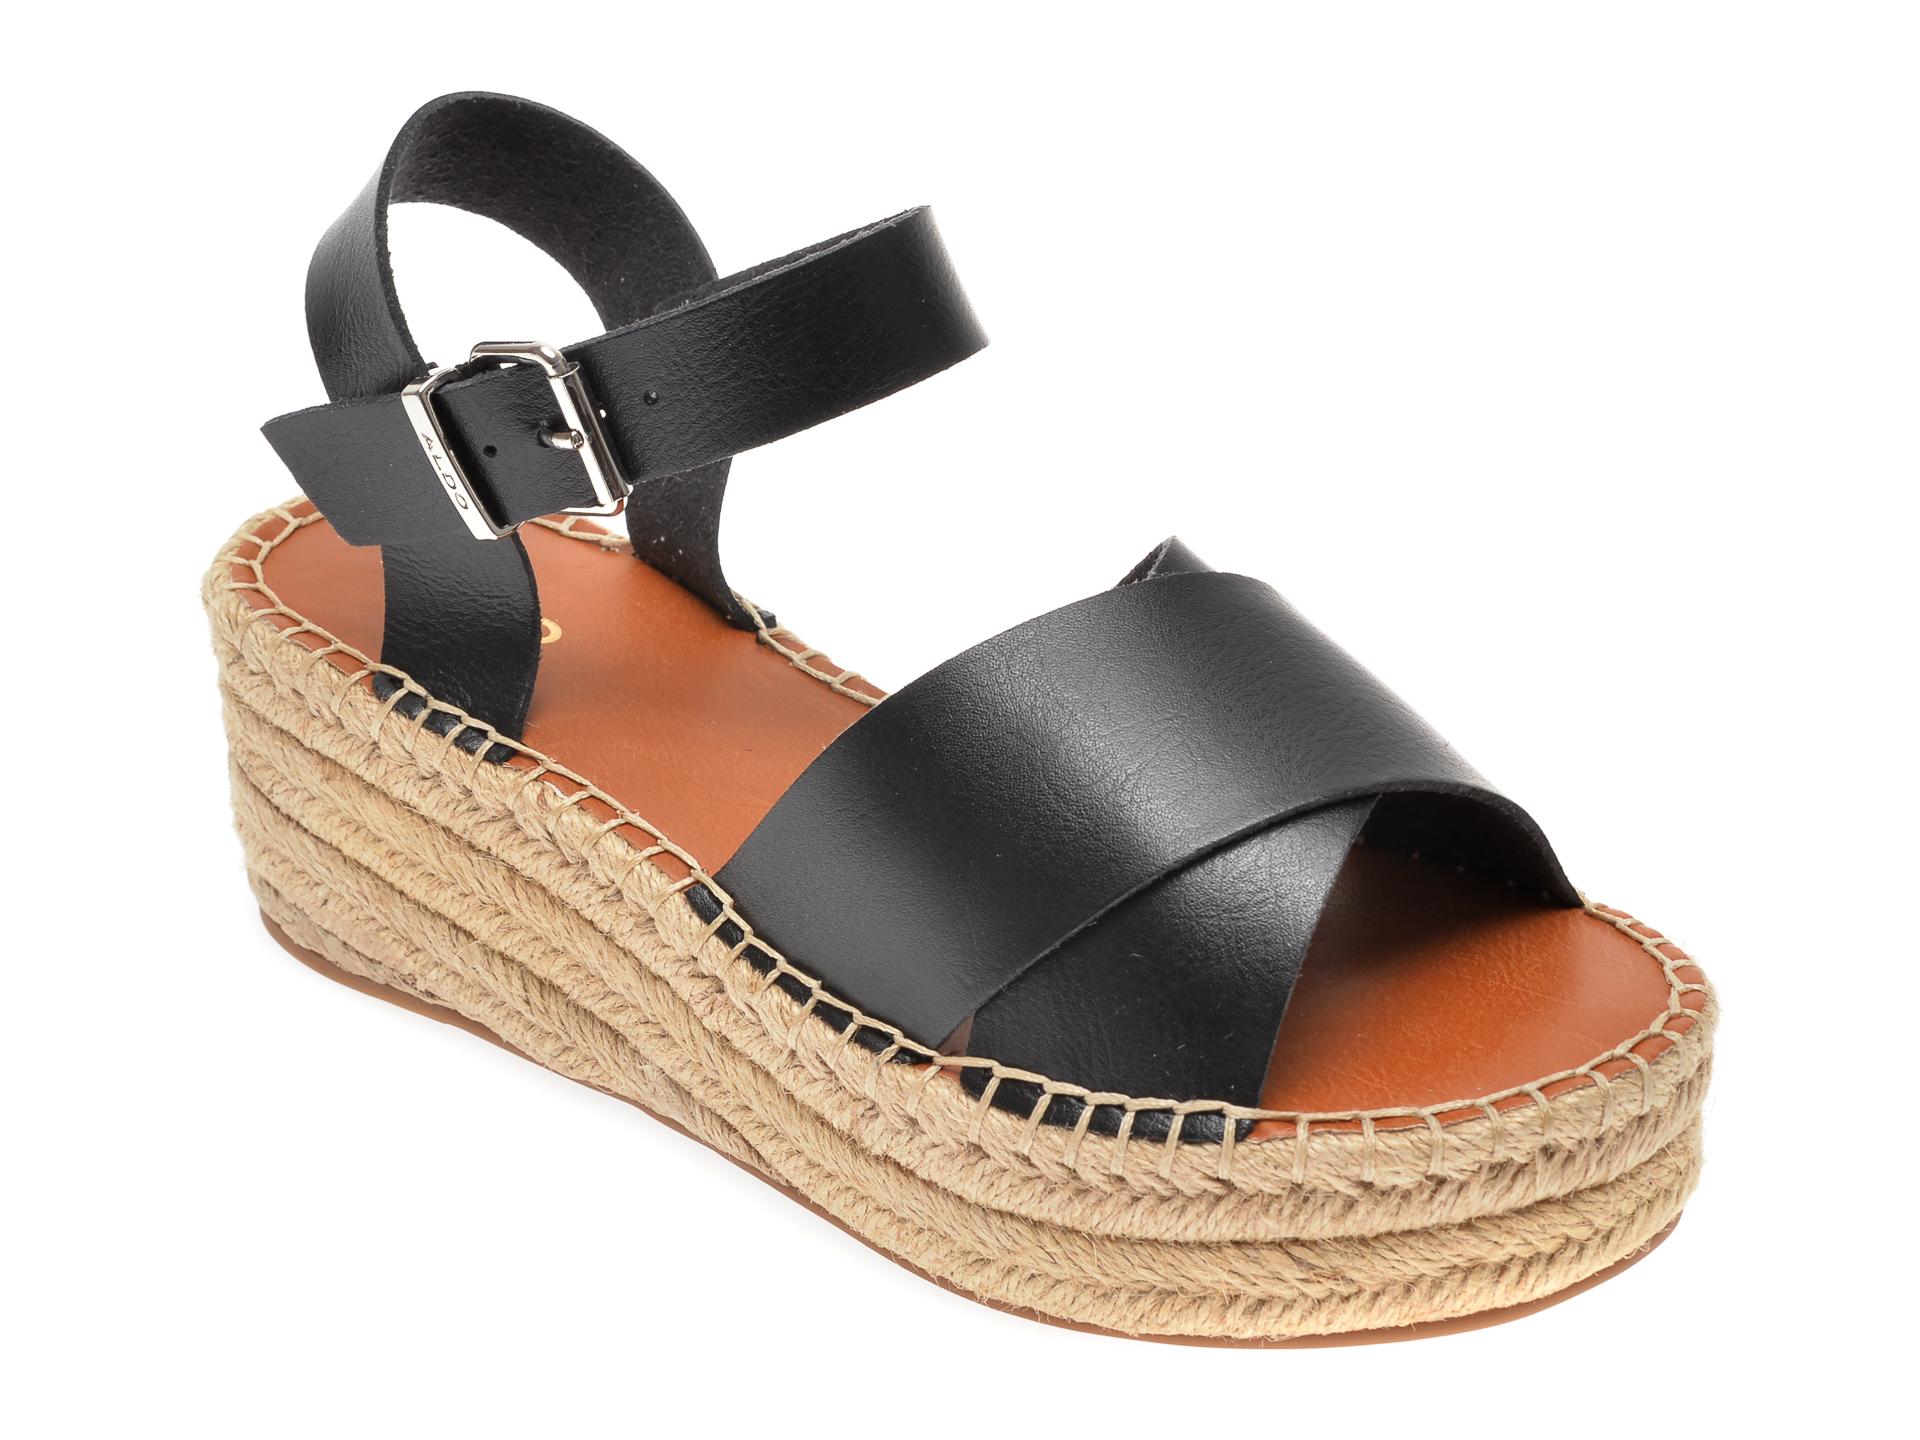 Sandale ALDO negre, Tineviel001, din piele ecologica imagine otter.ro